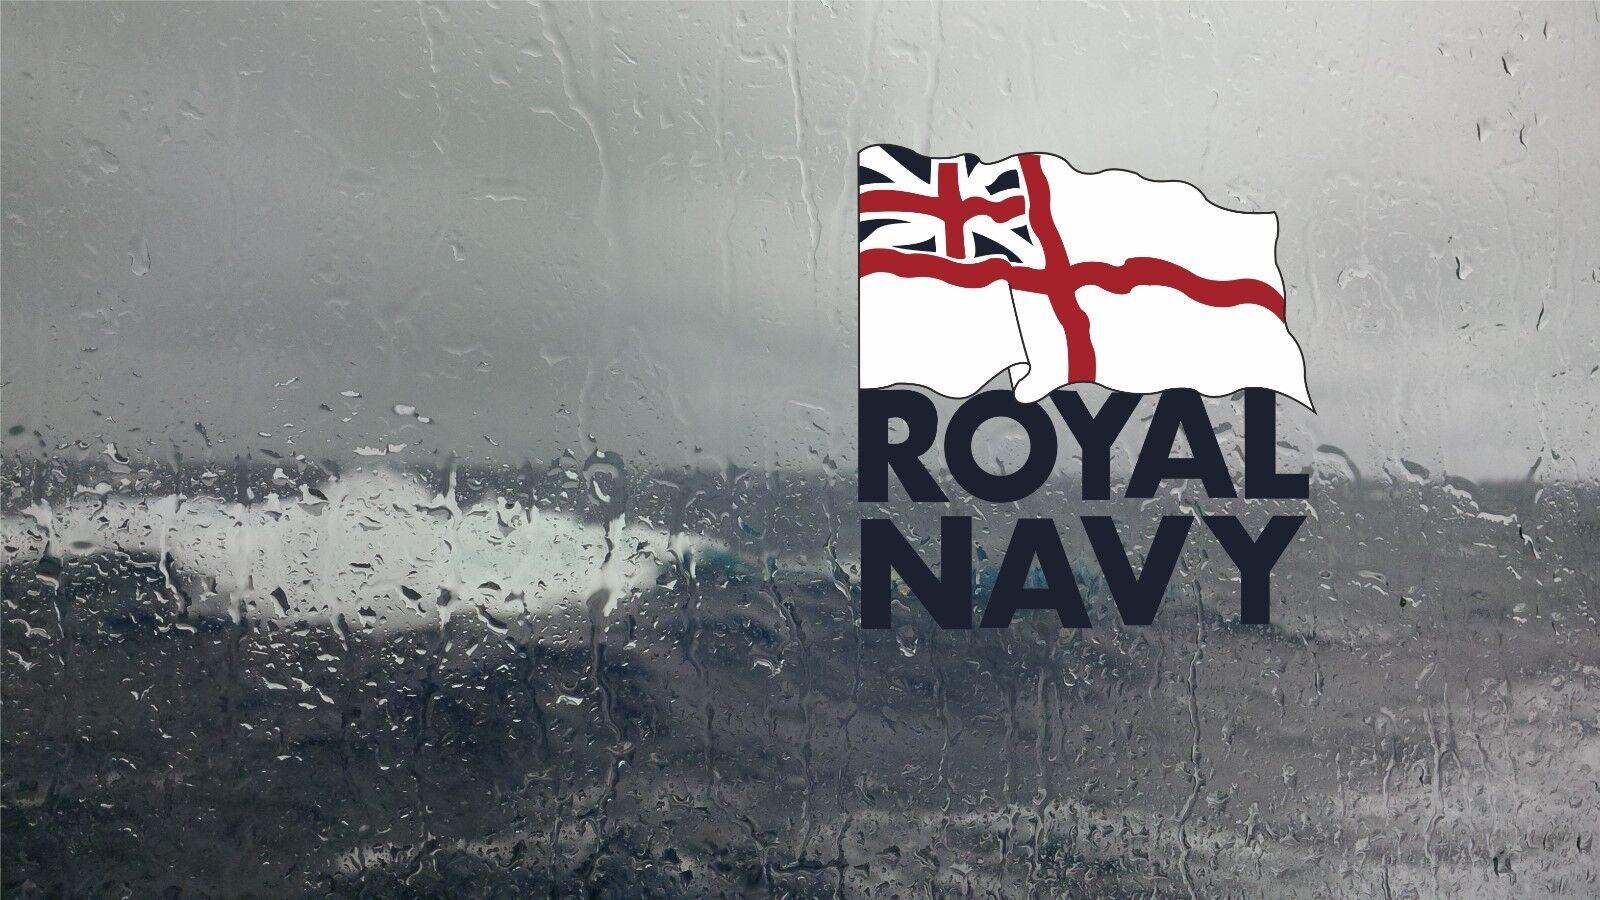 Royal Navy Internal Window Sticker Printed In reverse millitary sticker decal